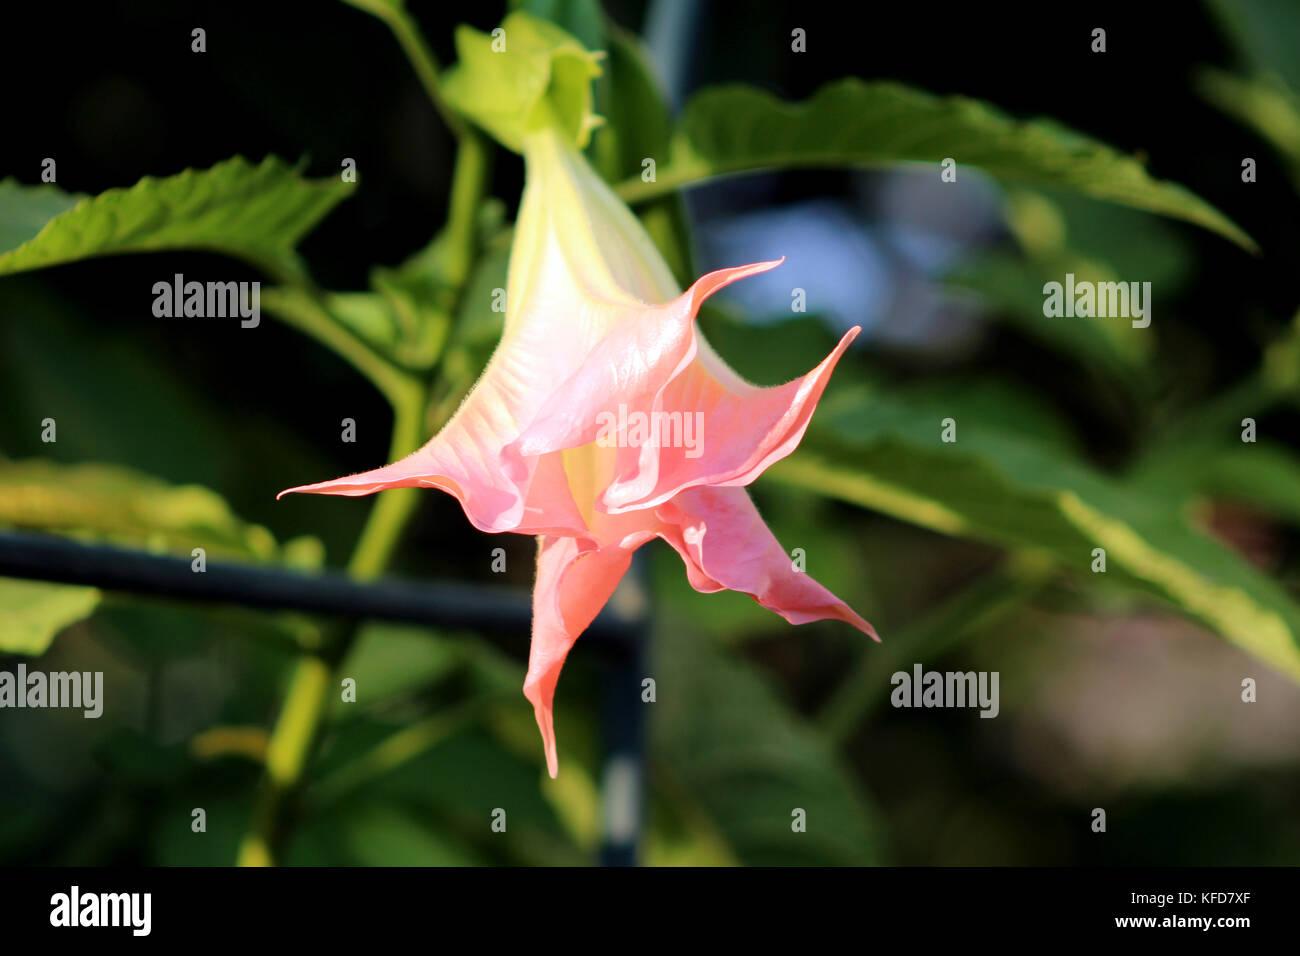 Pink Angels Trumpet Flower Brugmansia Arborea Closeup Of Fully